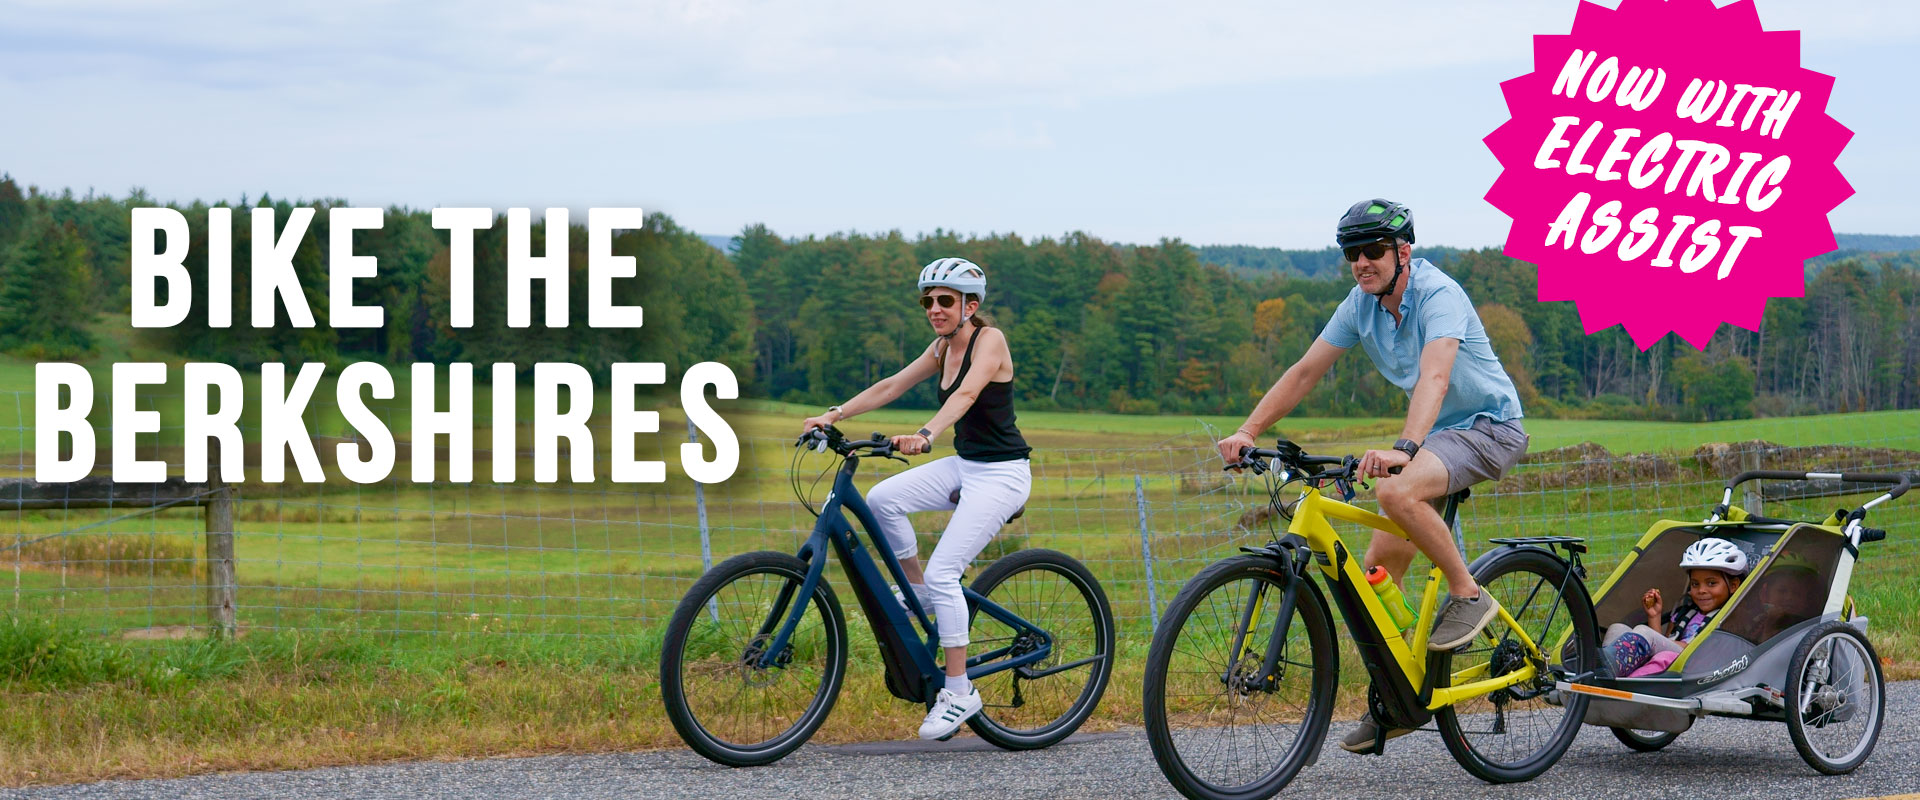 e-bike the berkshires | CLICK FOR OUR E-BIKES